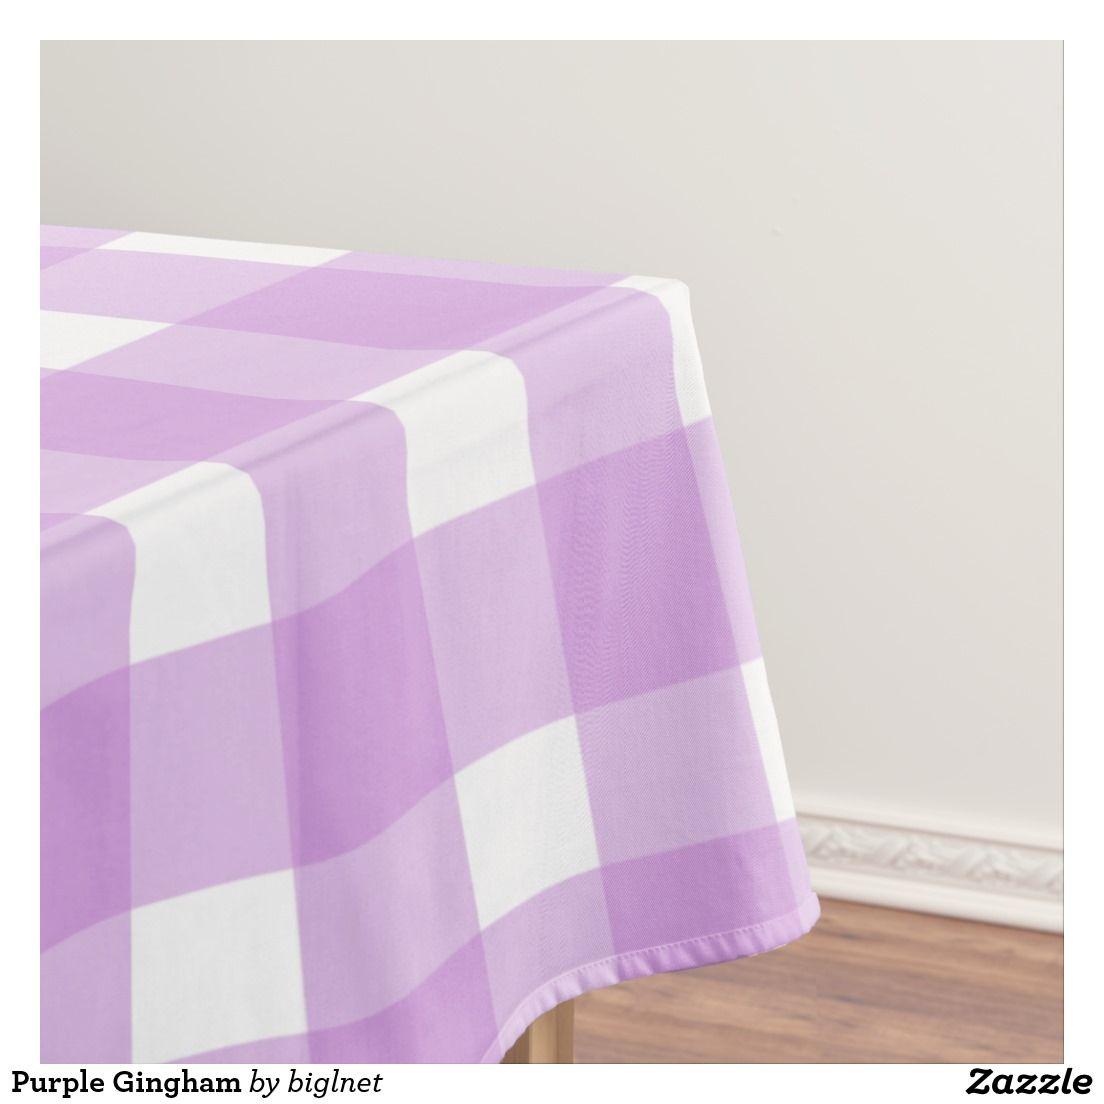 Ordinaire Purple Gingham Tablecloth